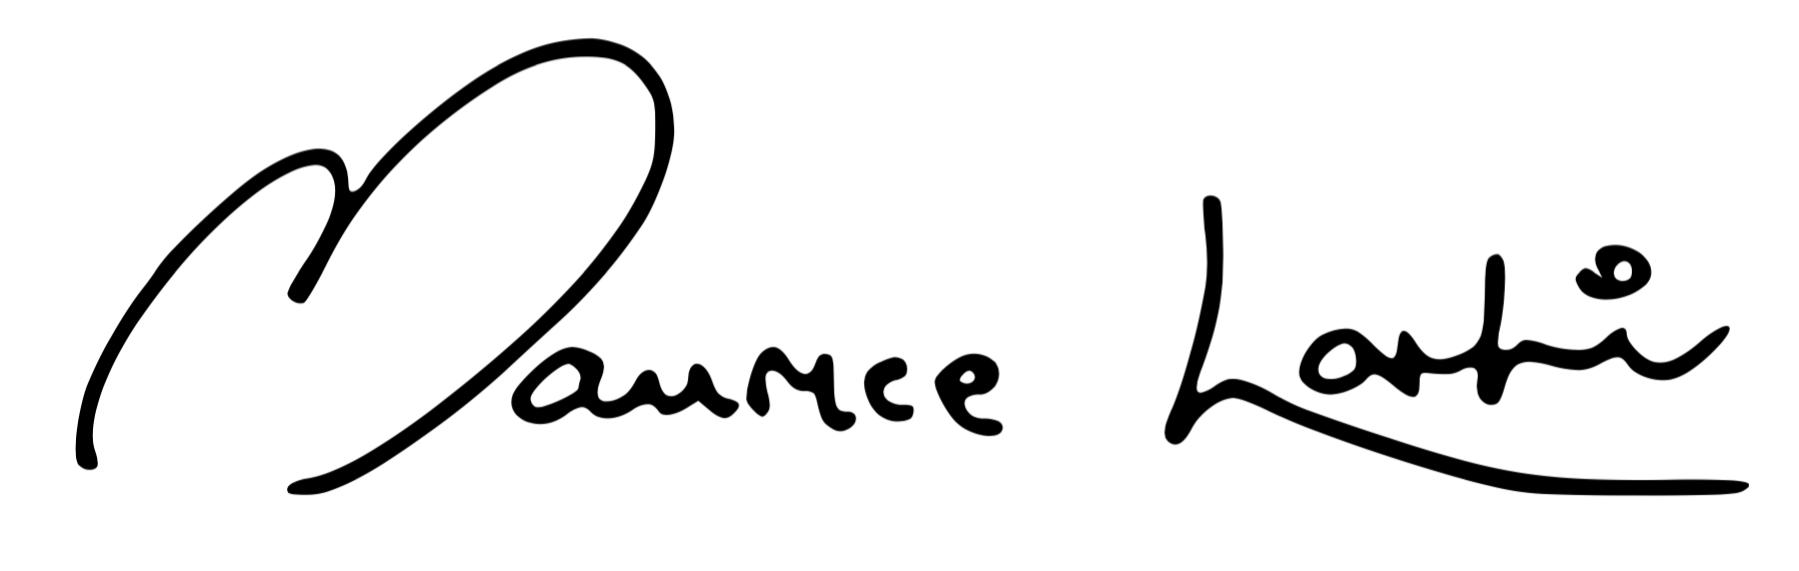 Maurice Larkin's Signature